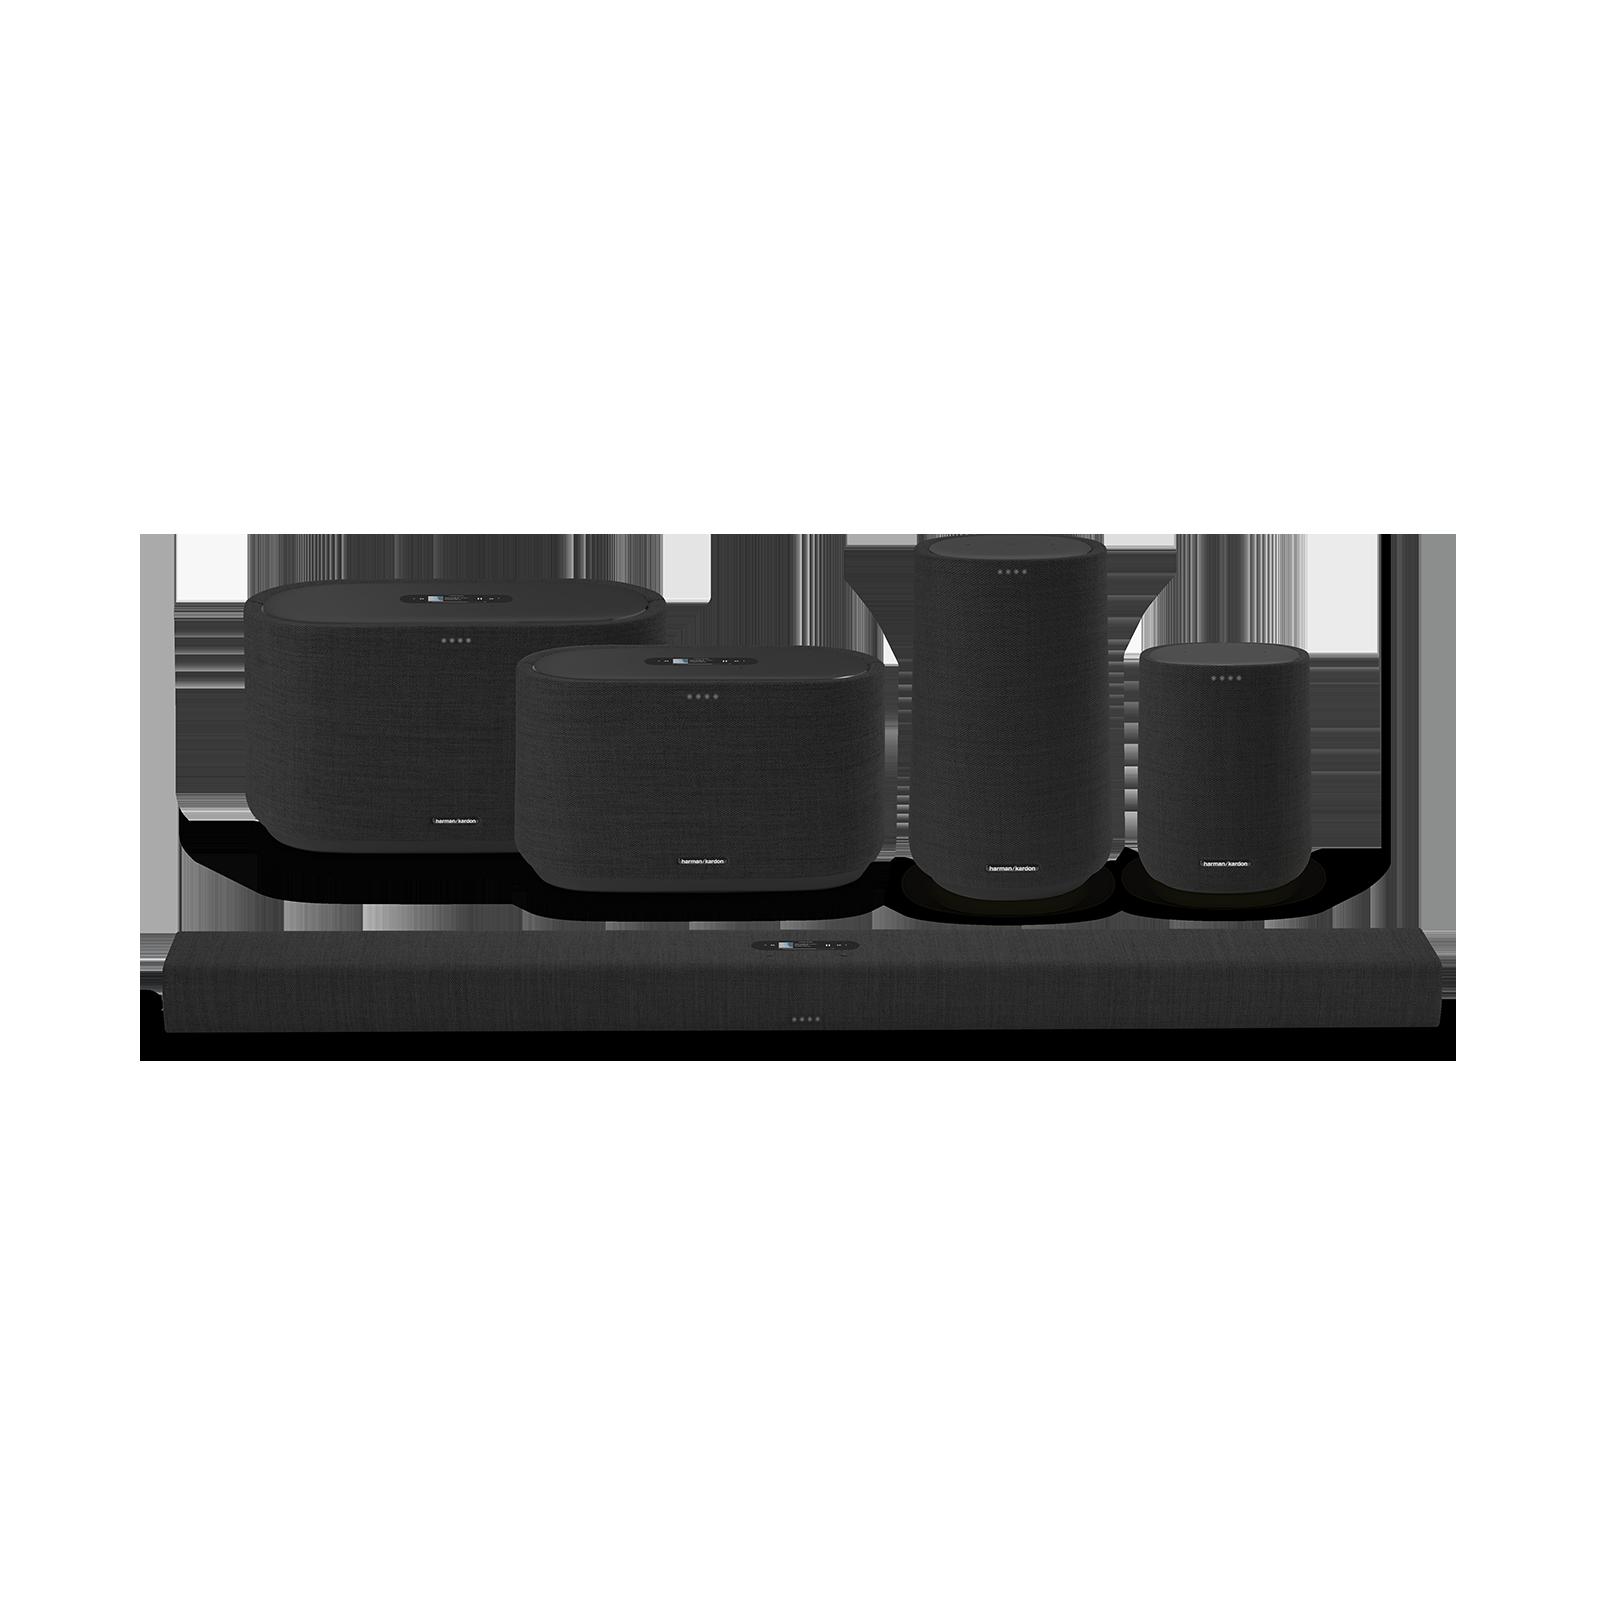 Harman Kardon Citation 300 - Black - The medium-size smart home speaker with award winning design - Detailshot 5